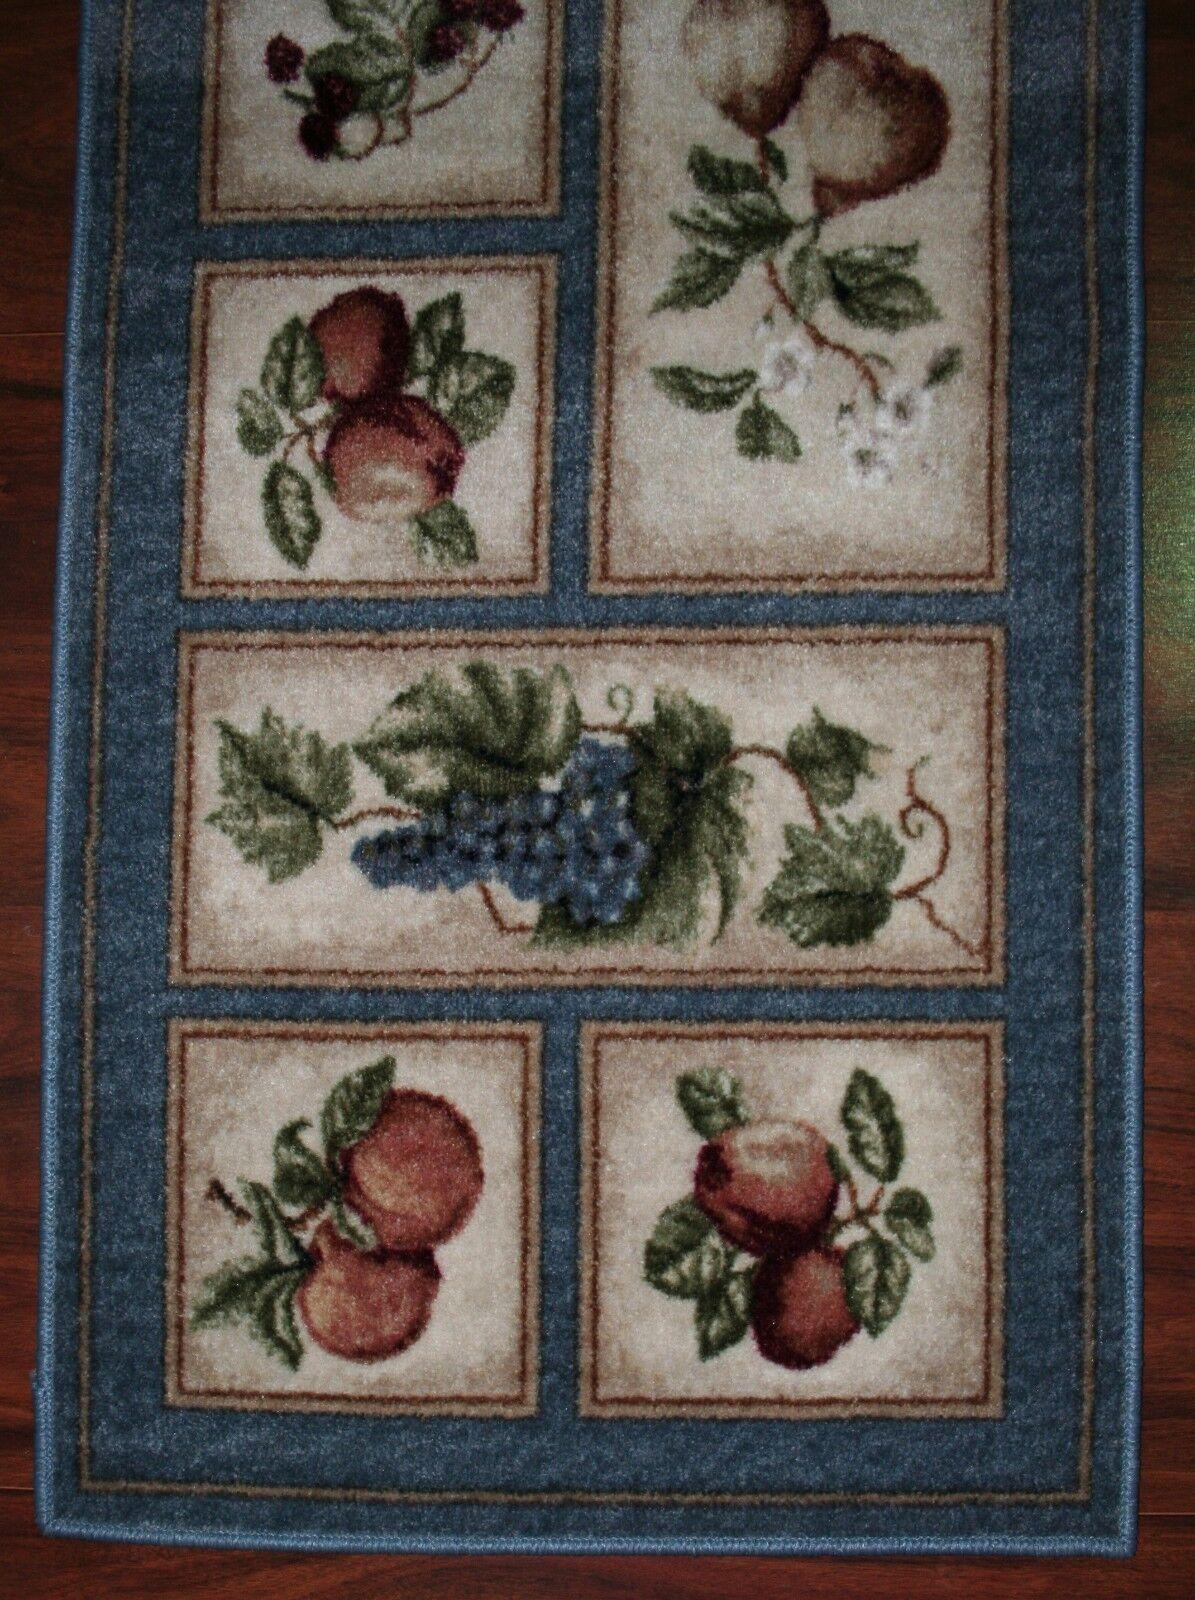 2X9 Kitchen Kitchen Kitchen Runner Mat Rug Sky Blau Beige Washable Fruit Grapes Pears Apples 8d10a0